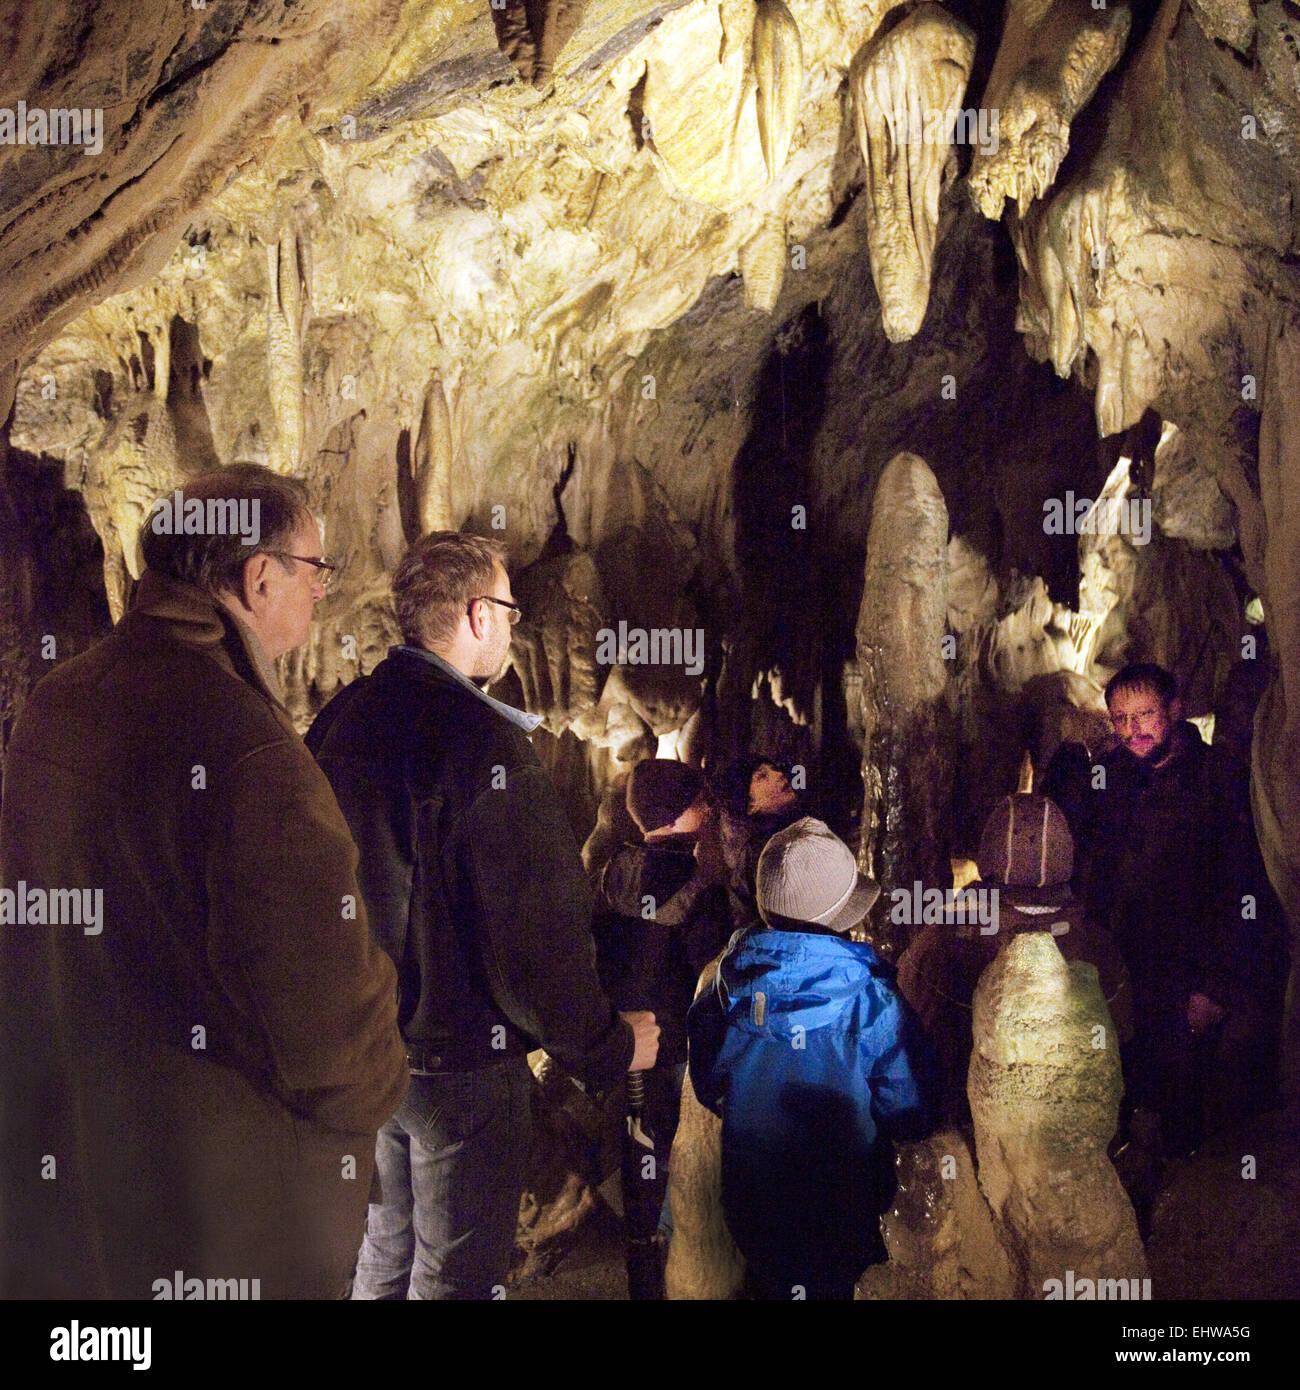 Visitors in the Bilsteinhöhle in Warstein. - Stock Image